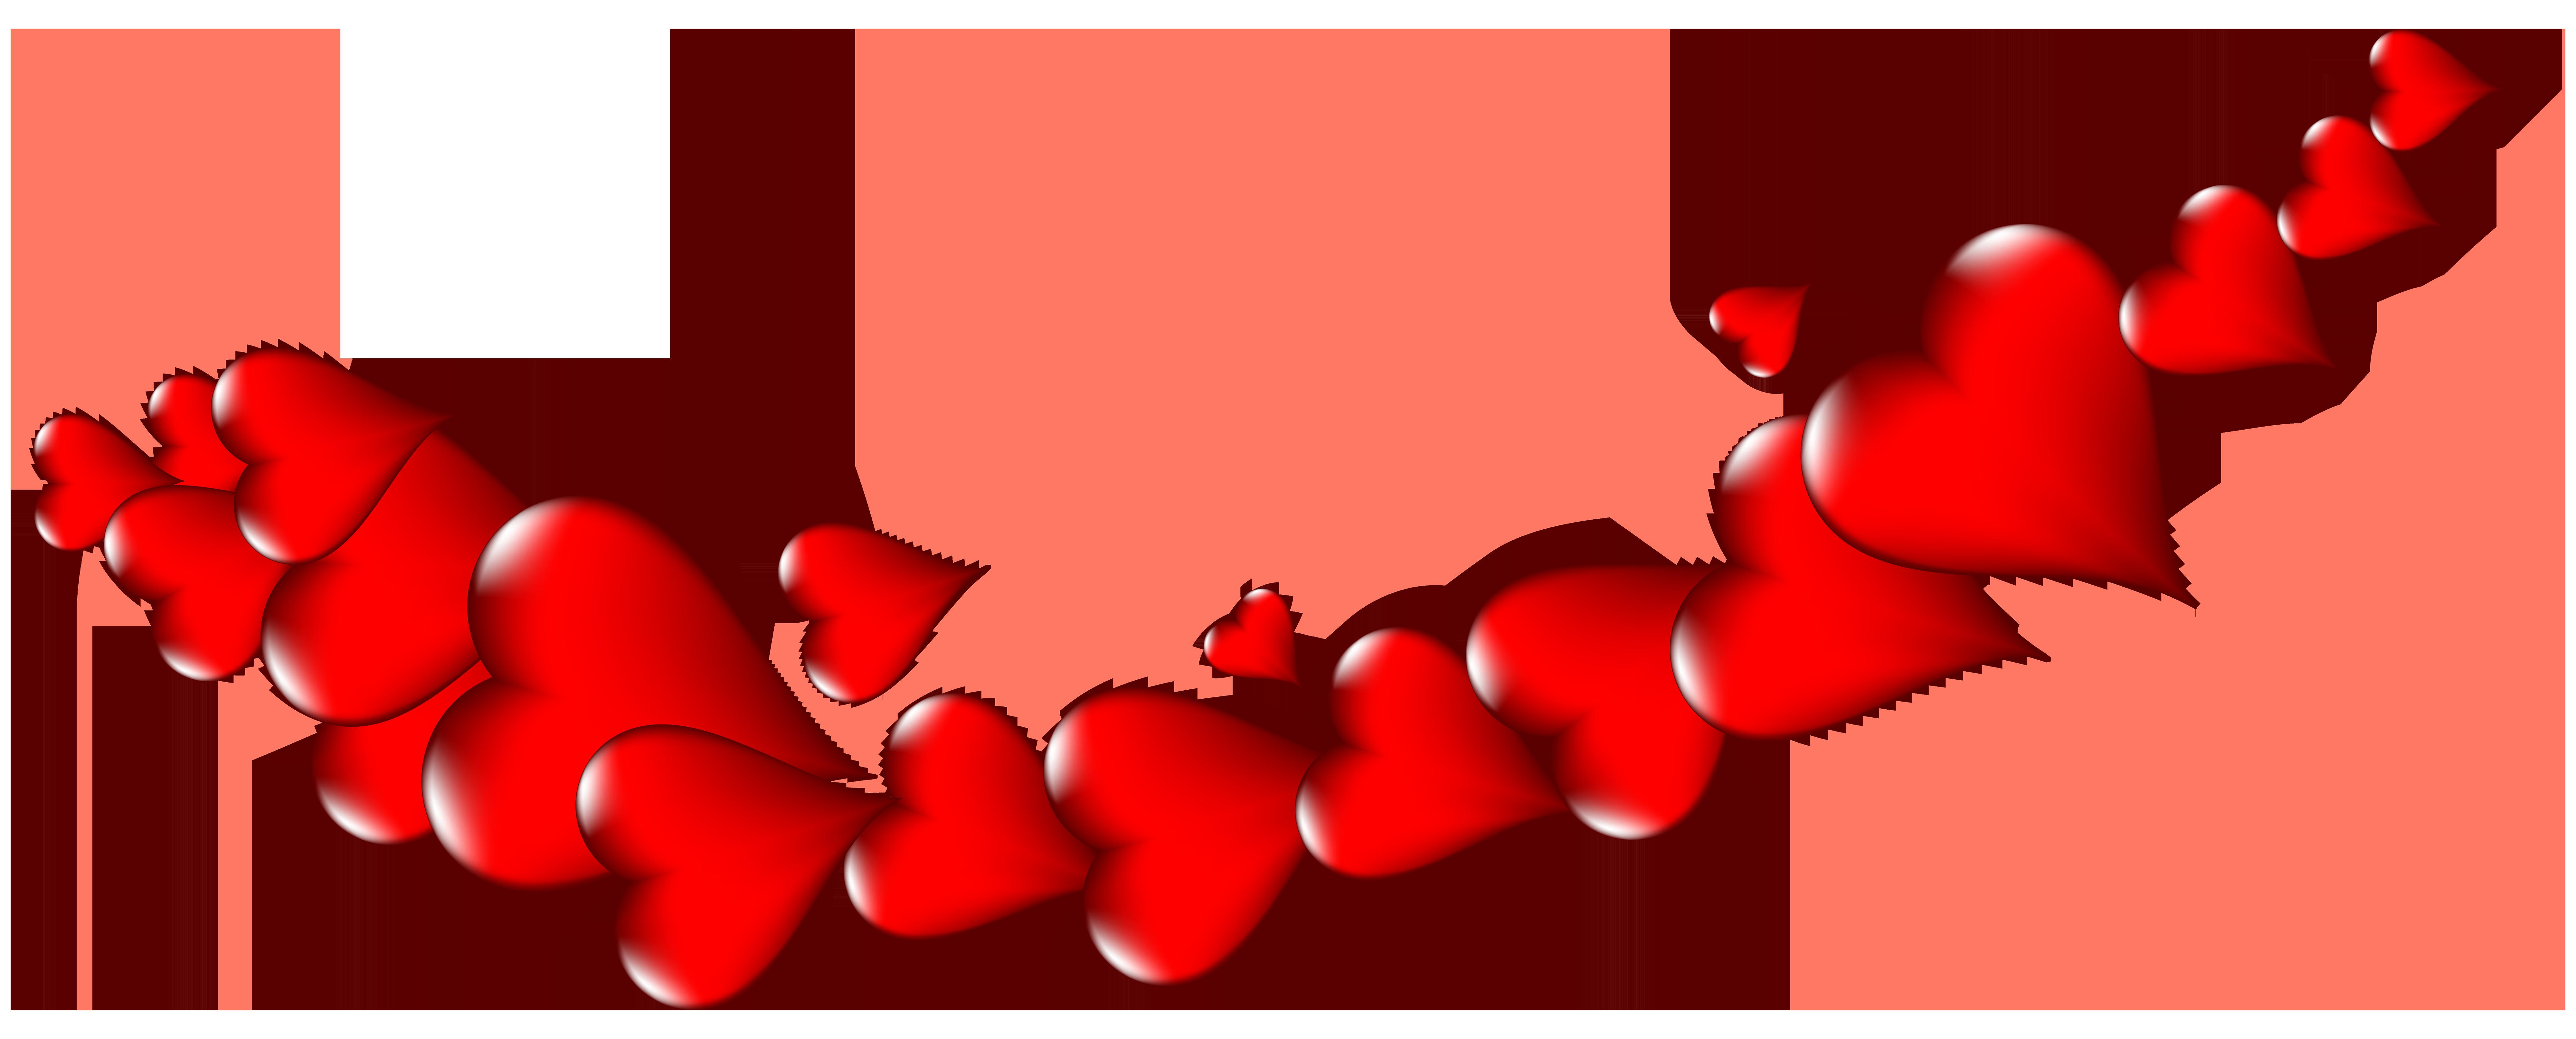 Decor png clip art. Clipart hearts banner